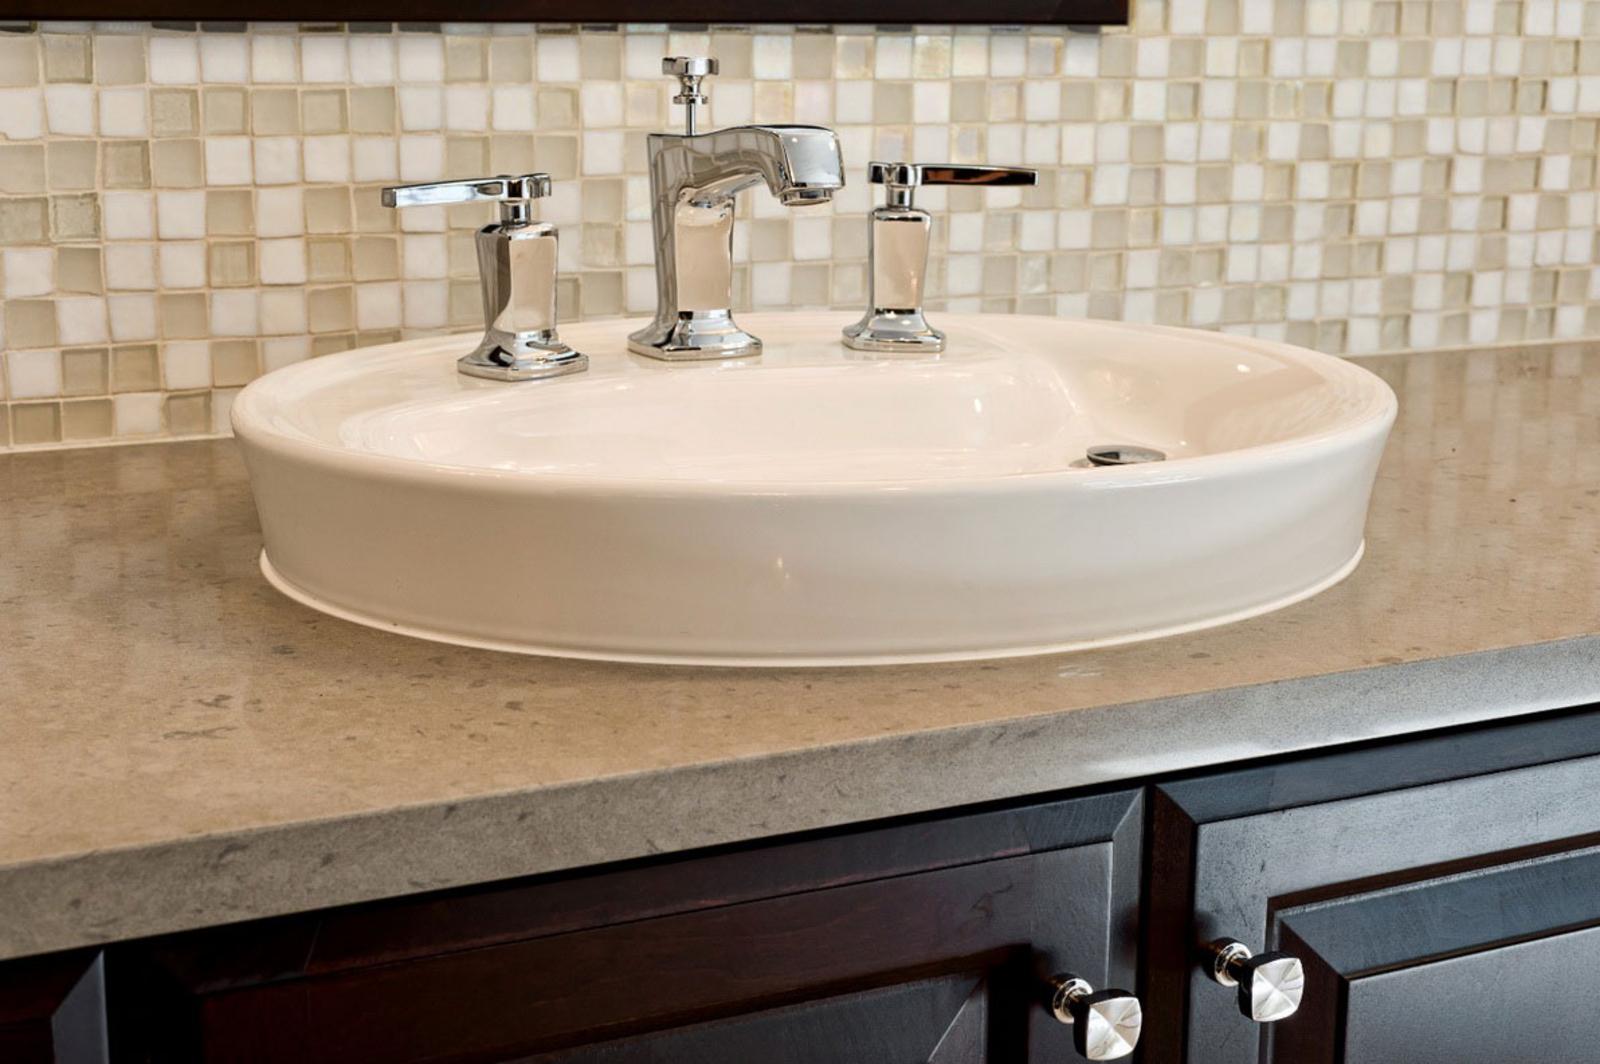 1600x1200-wonderful-bathroom-mosaic-tile-ideas